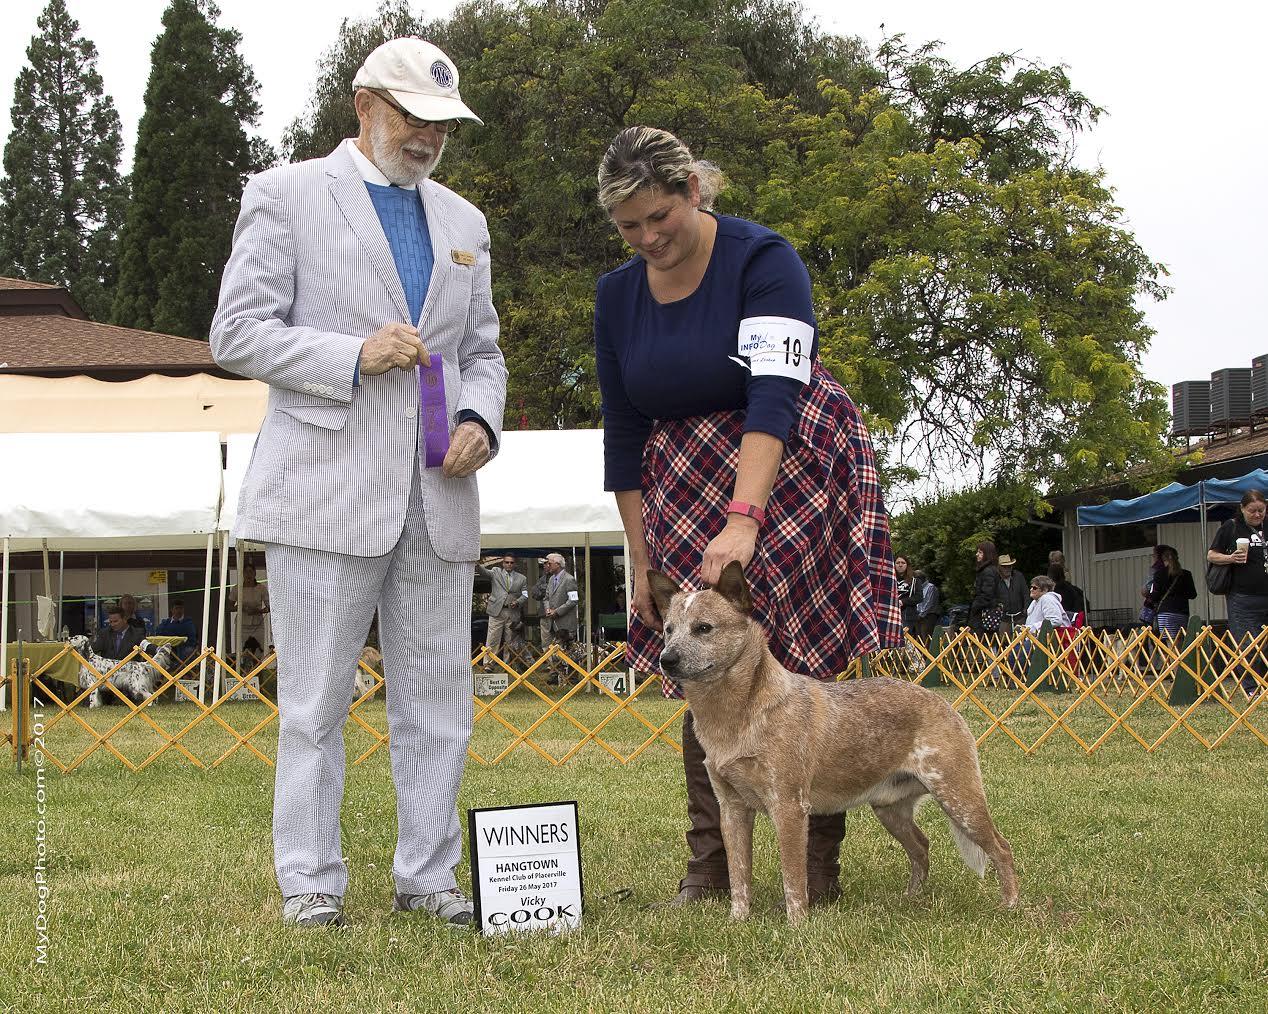 Cobalt kennels Australian cattle dogs